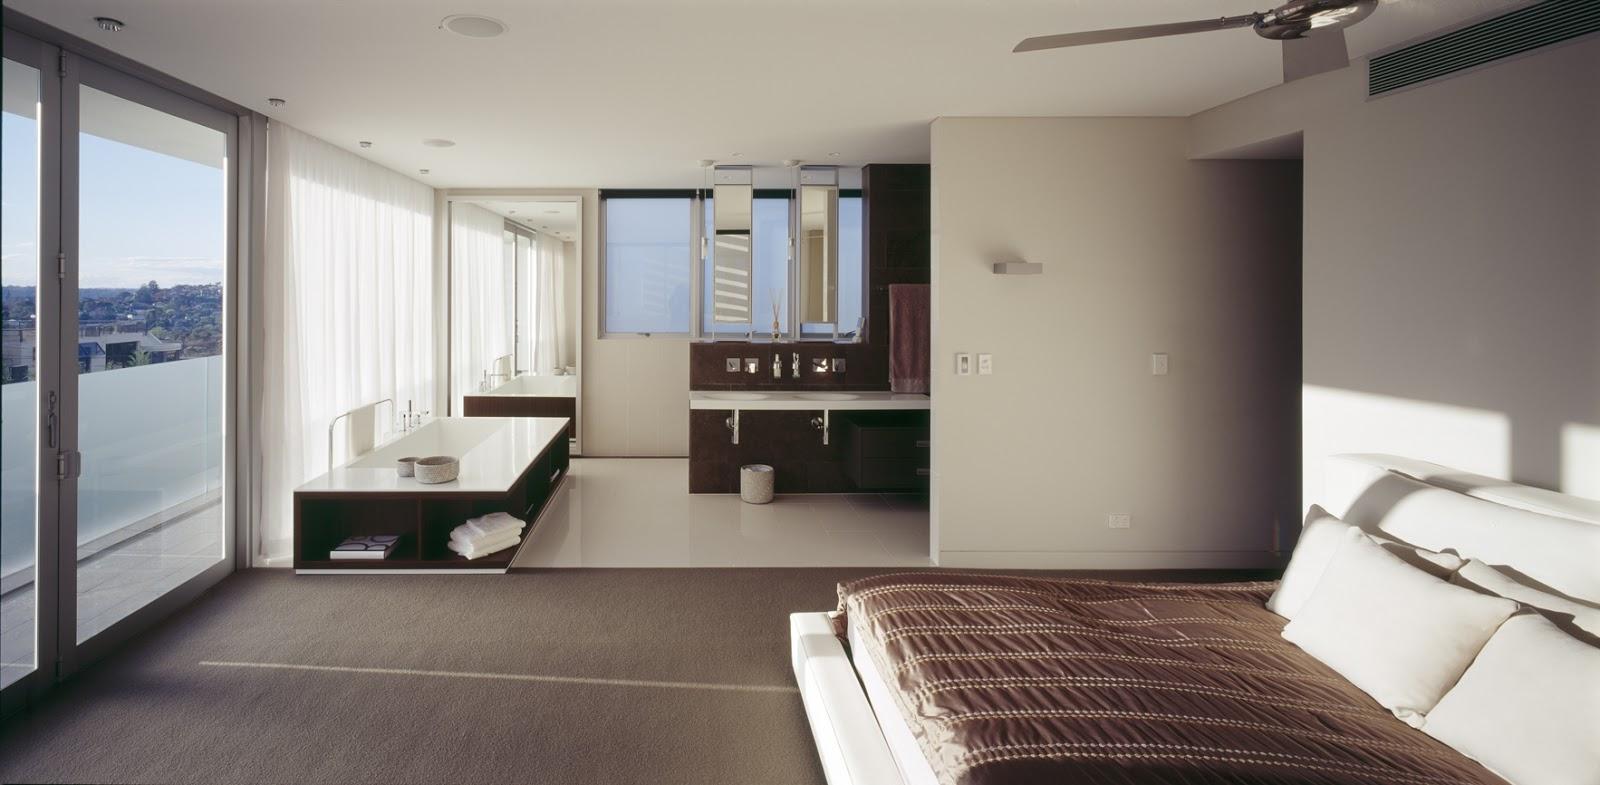 Freestanding Bath Shower Minosa The Open Plan Ensuite Or Parents Retreat A Few Tips